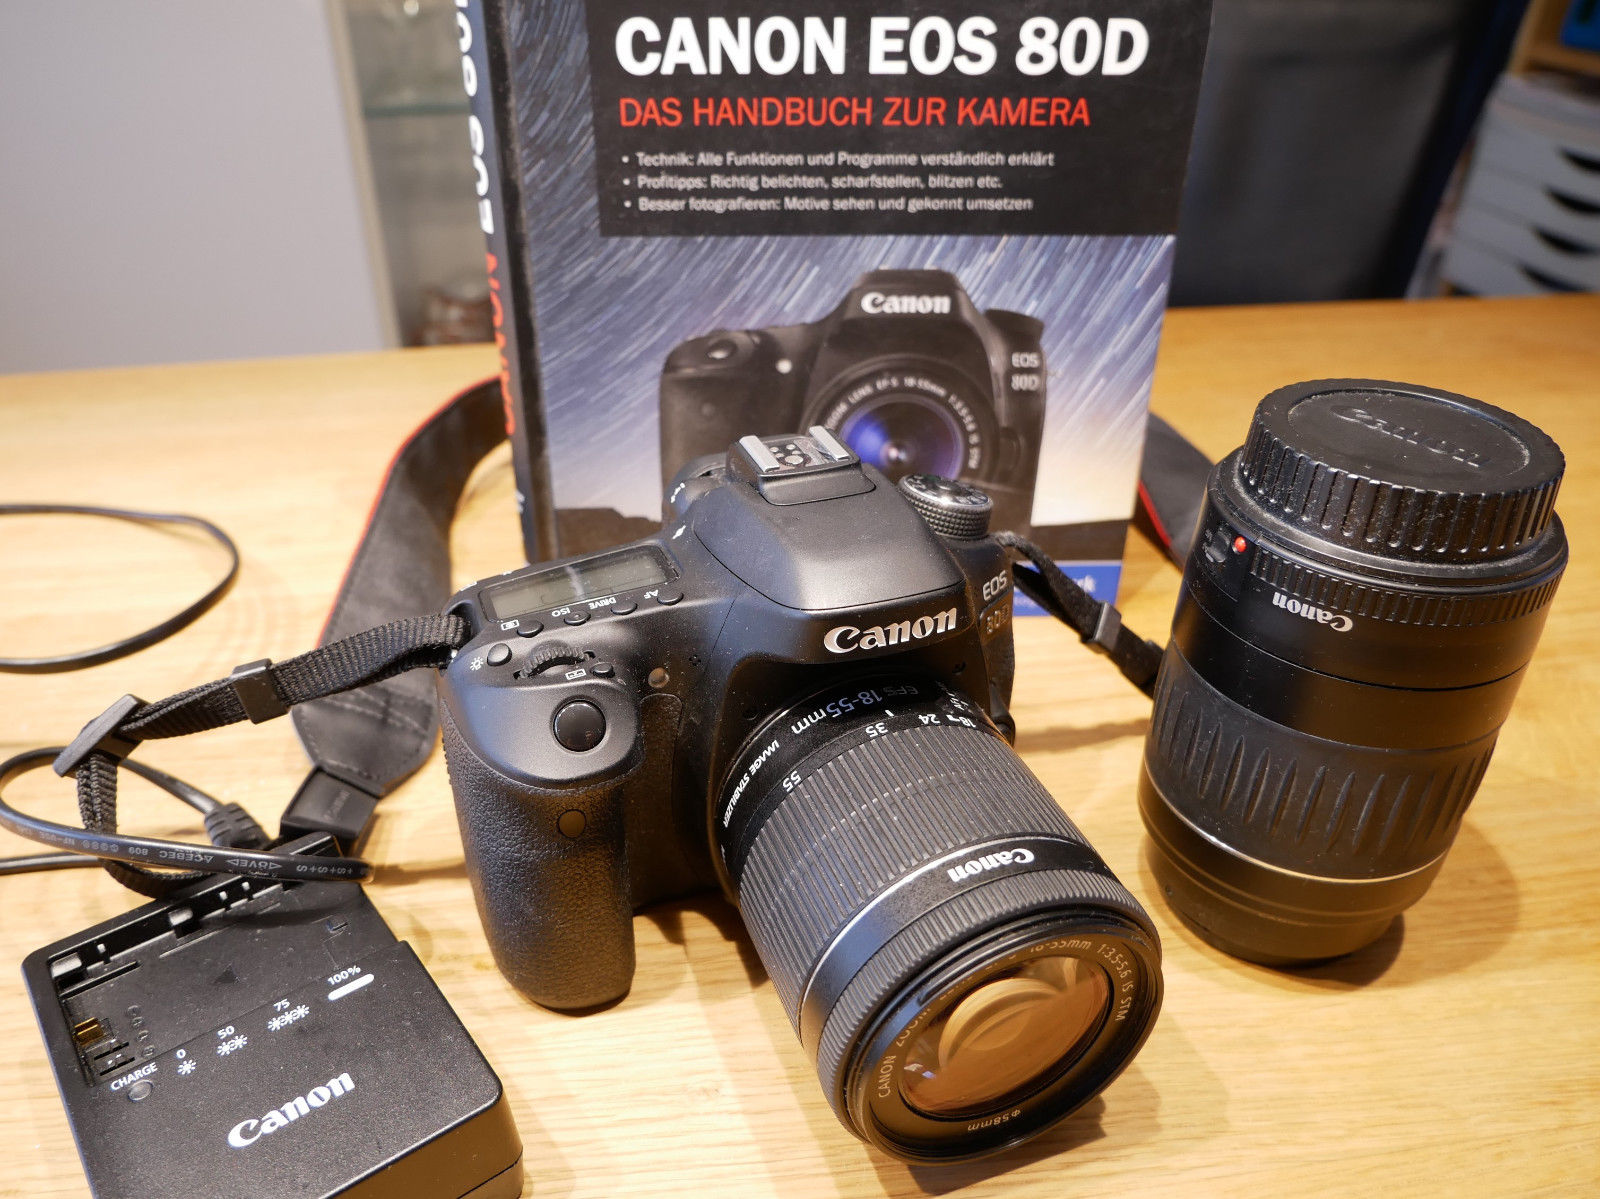 Canon EOS 80D 24.2MP Digitalkamera - Schwarz (Kit mit EF-S 18-135mm Objektiv)